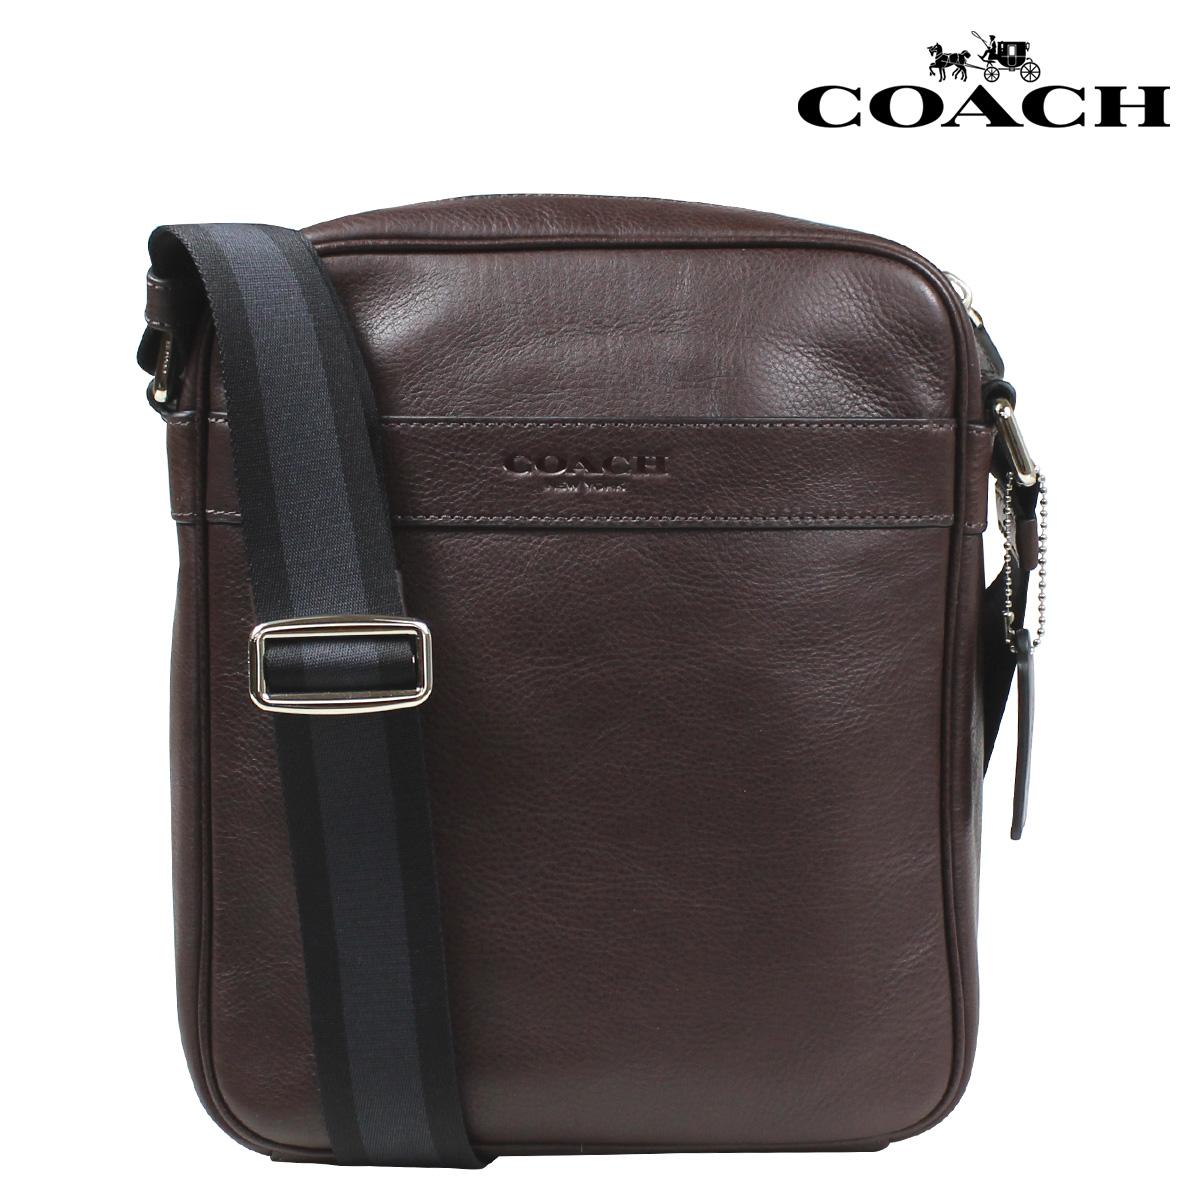 d7d9c2d4557 ALLSPORTS: 코치 COACH 남자 가방 숄더백 F71723 마호가니 | 라쿠텐 일본